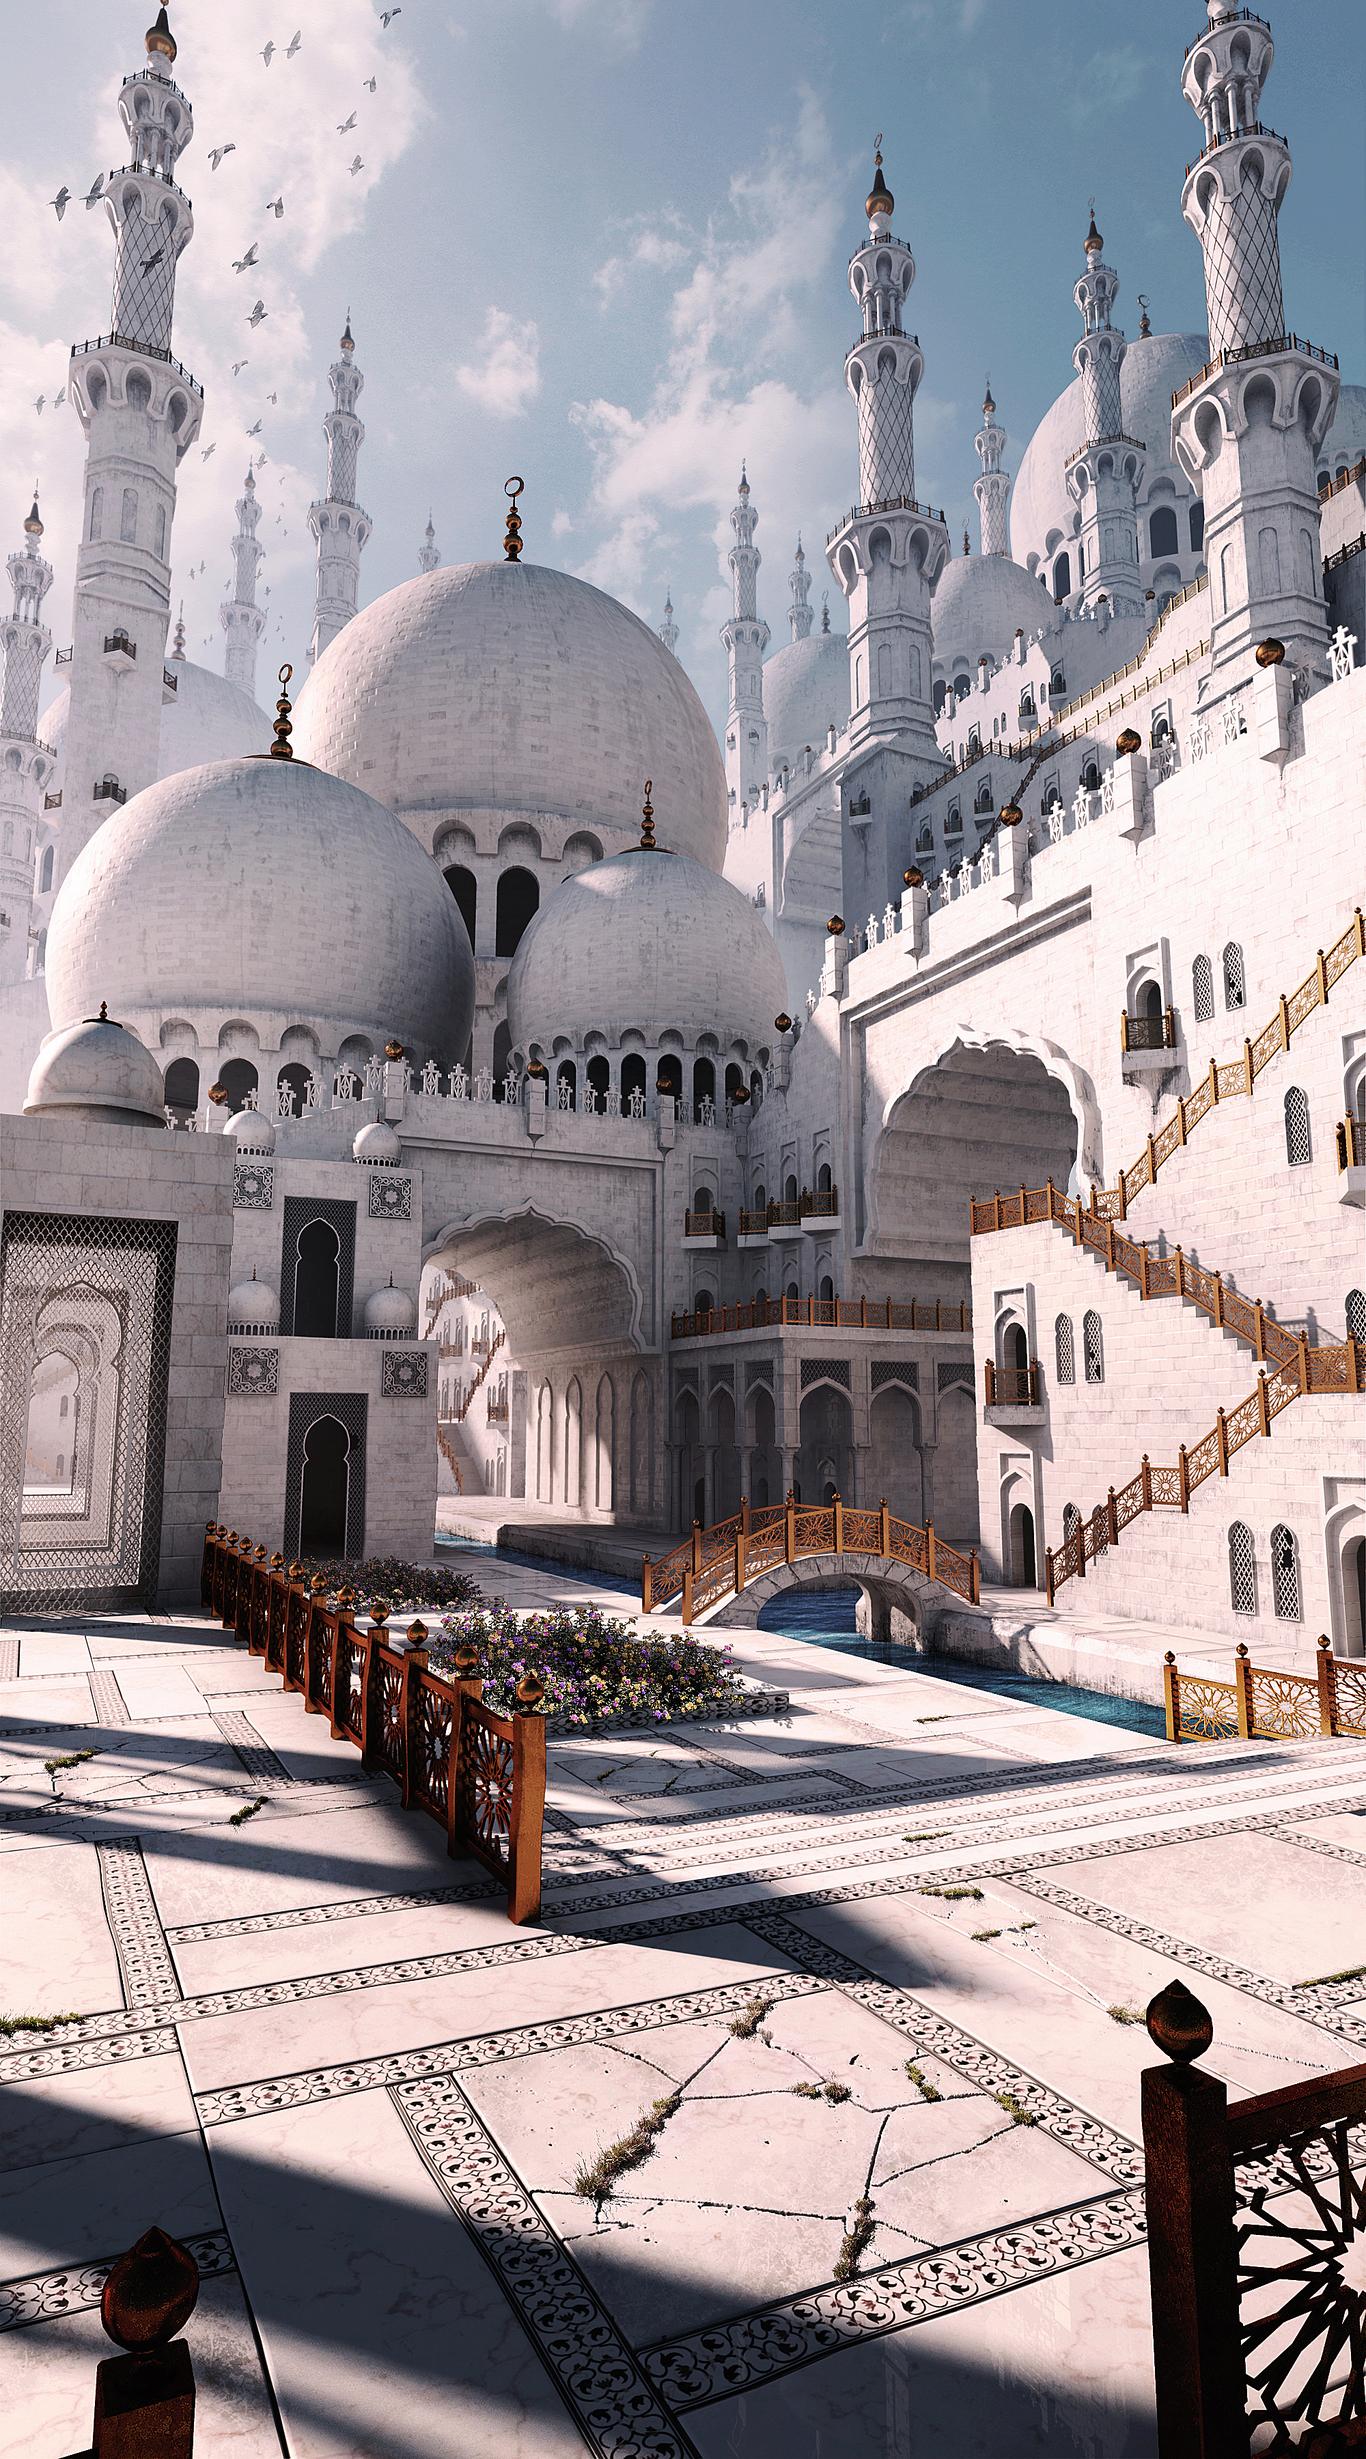 Gbhasin fantasy mosque 1 5f6fdd98 bqld